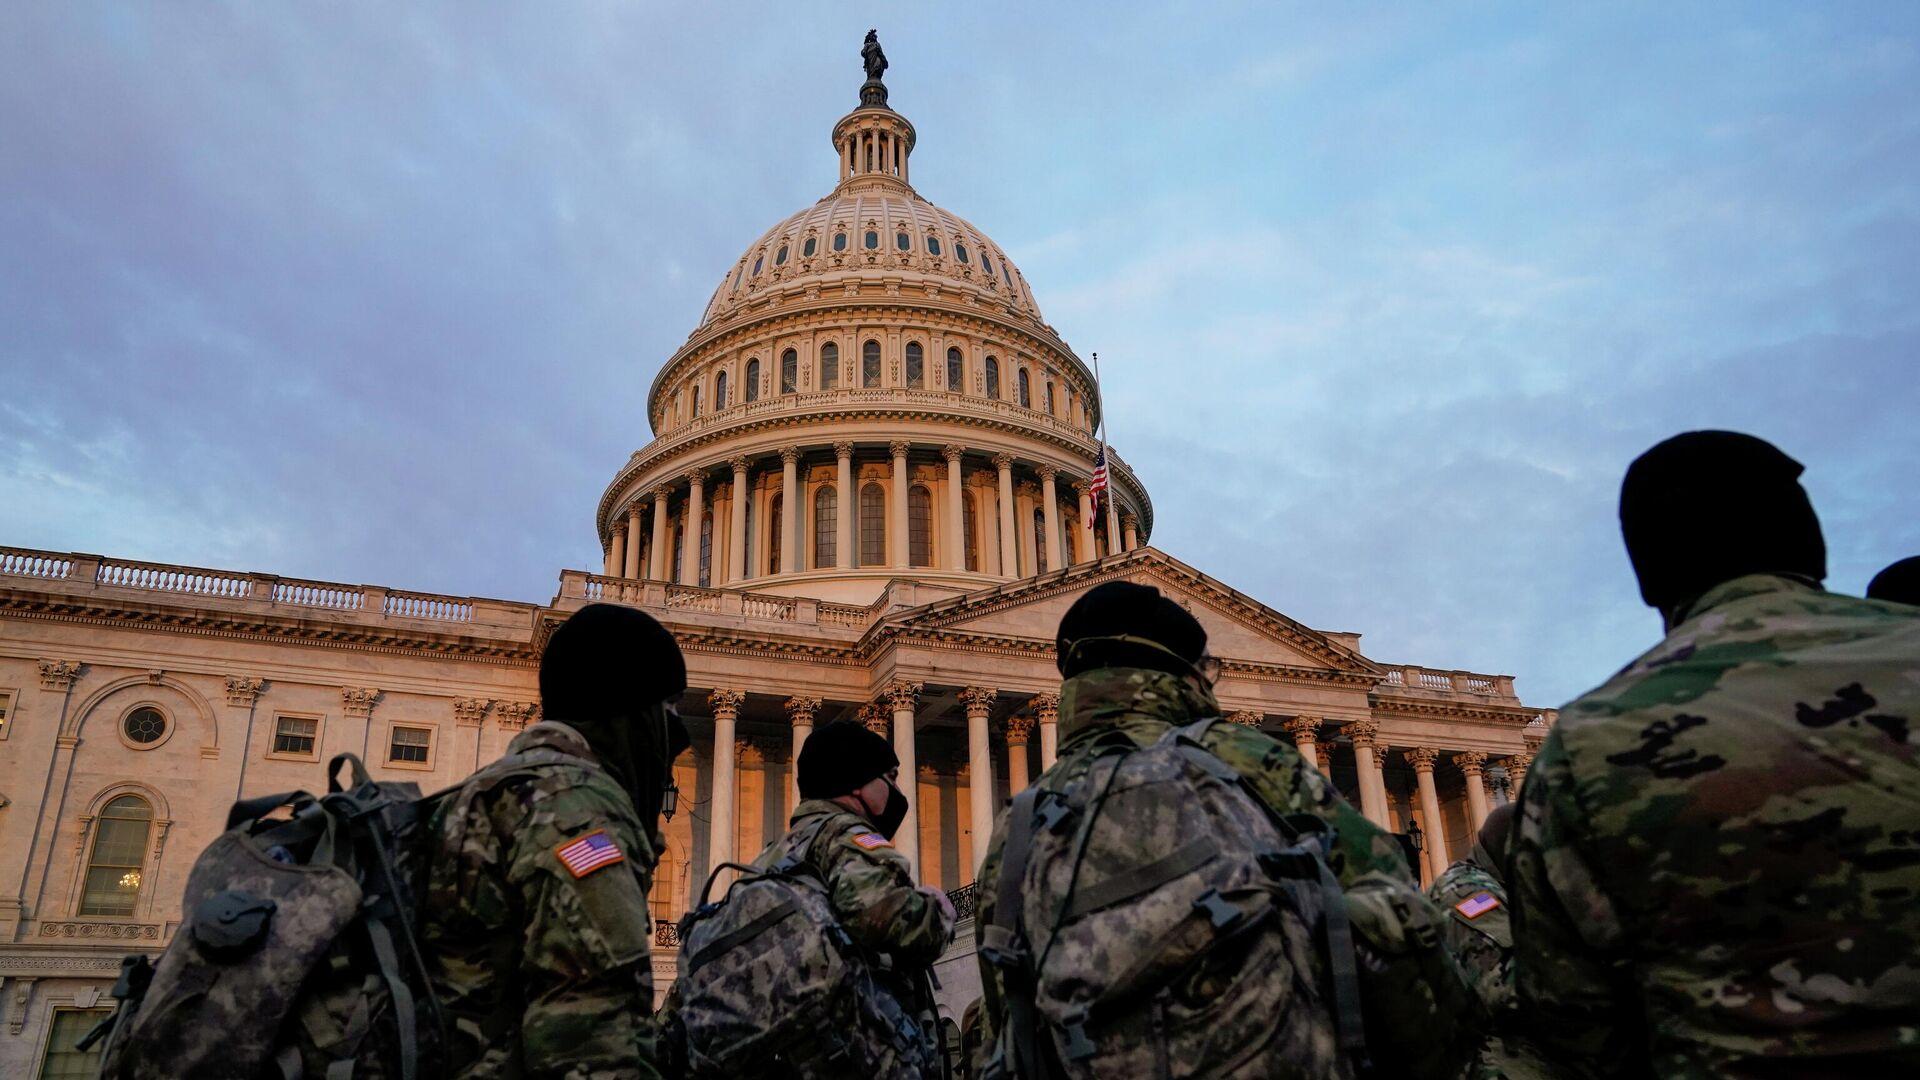 Kapitol in Washington DC. am 11. Januar 2021 - SNA, 1920, 19.09.2021